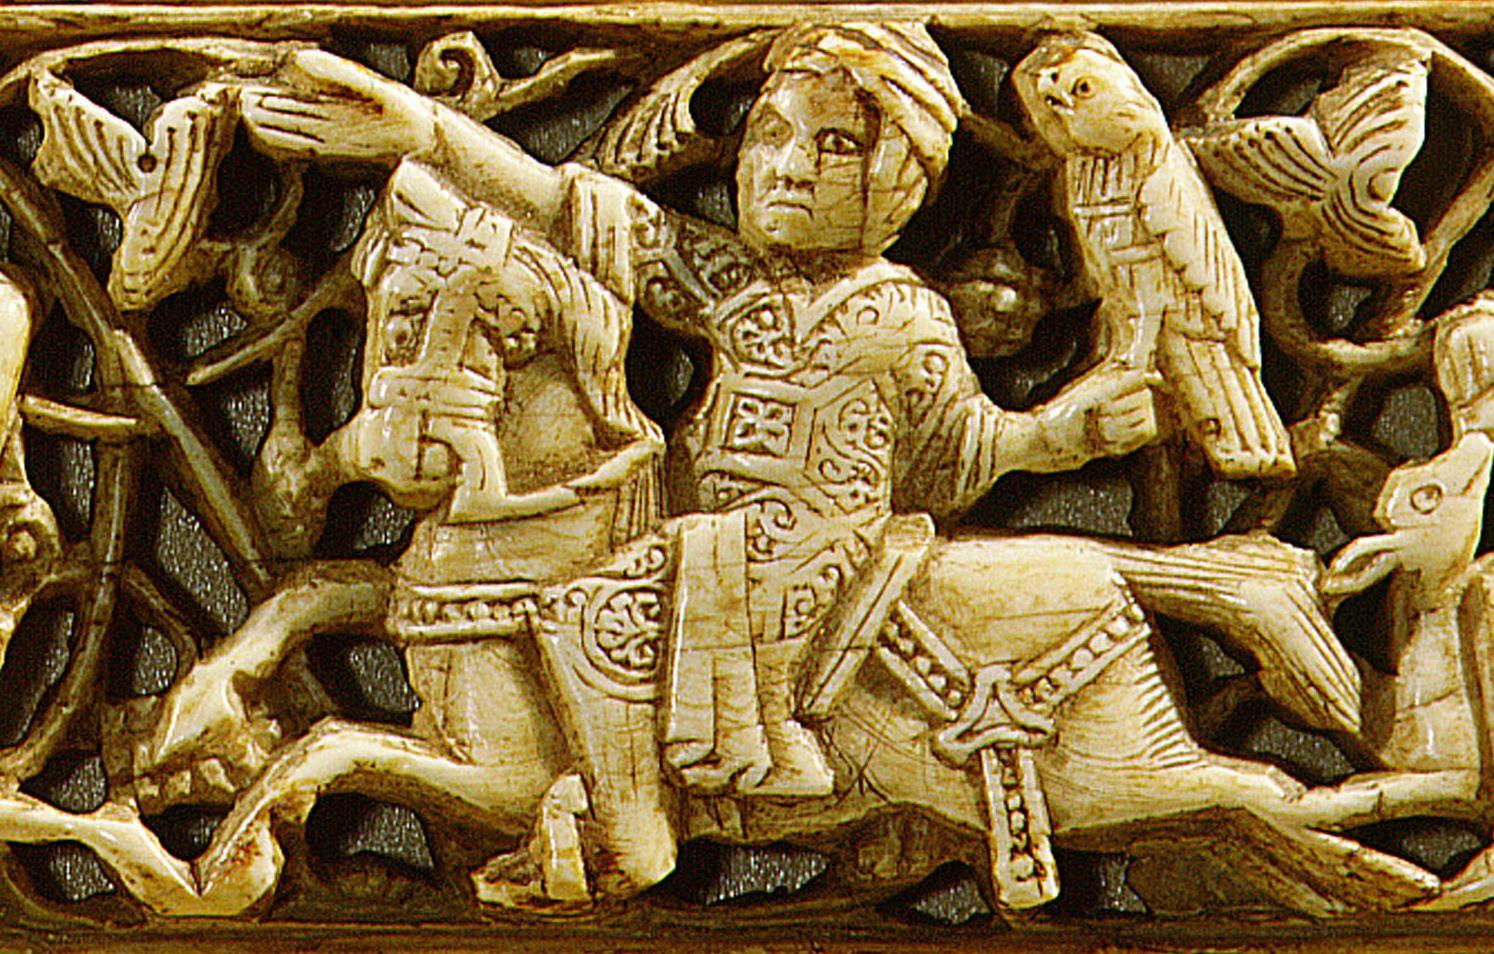 Museum Fur Islamische Kunst Staatliche Museen Berlin Fatimid Illustrations Of Soldiers And Hunters 10th 1 Islamic Art Pergamon Museum Animal Sculptures